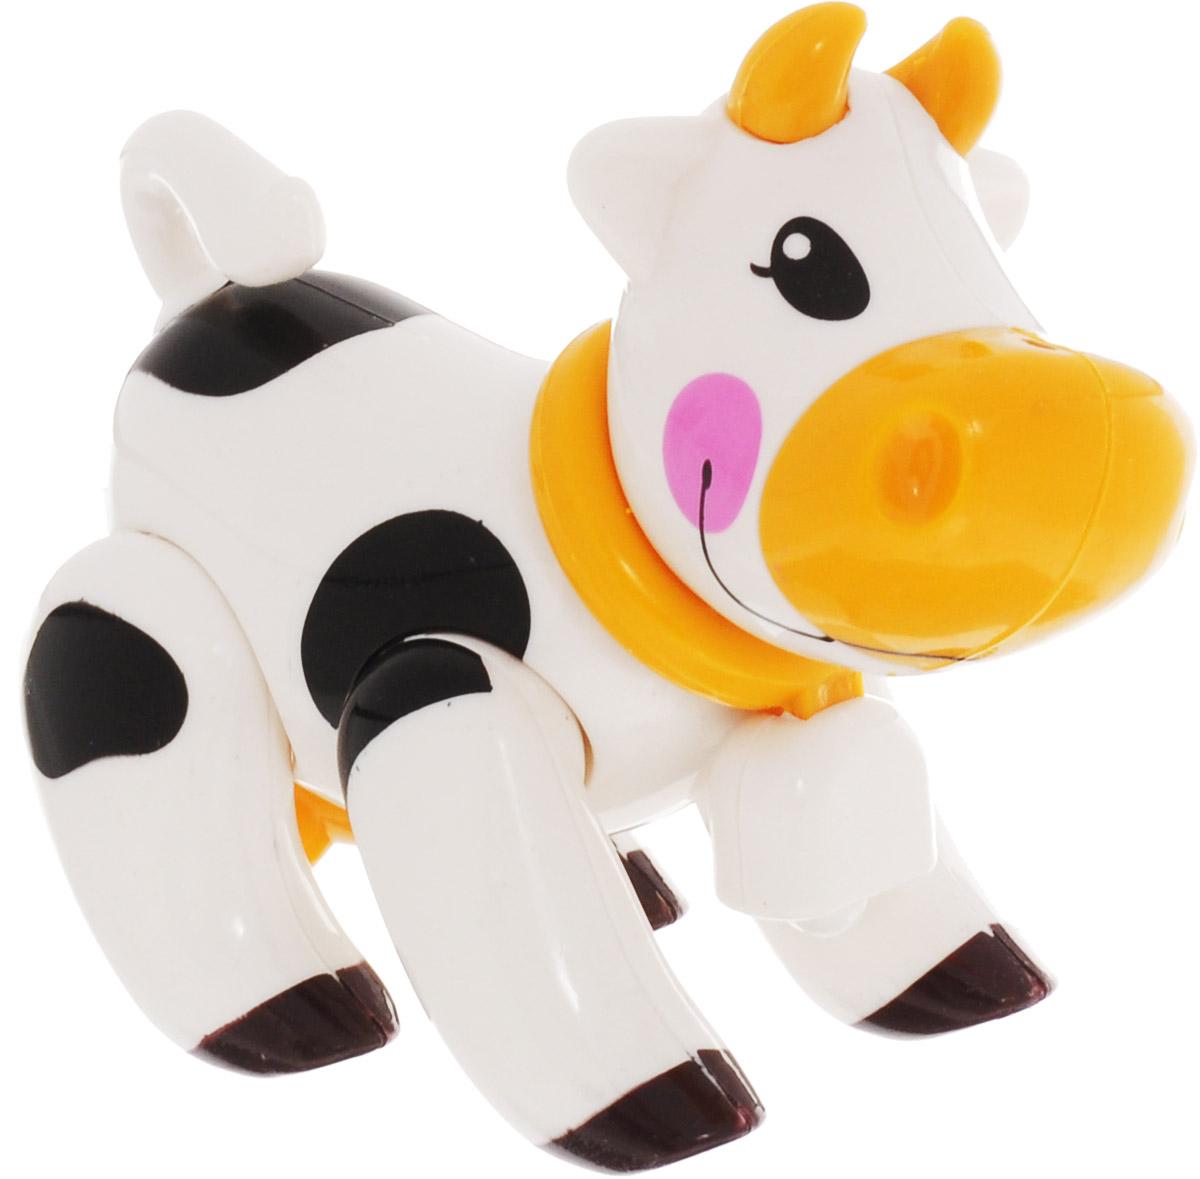 Ути-Пути Развивающая игрушка Корова цвет белый